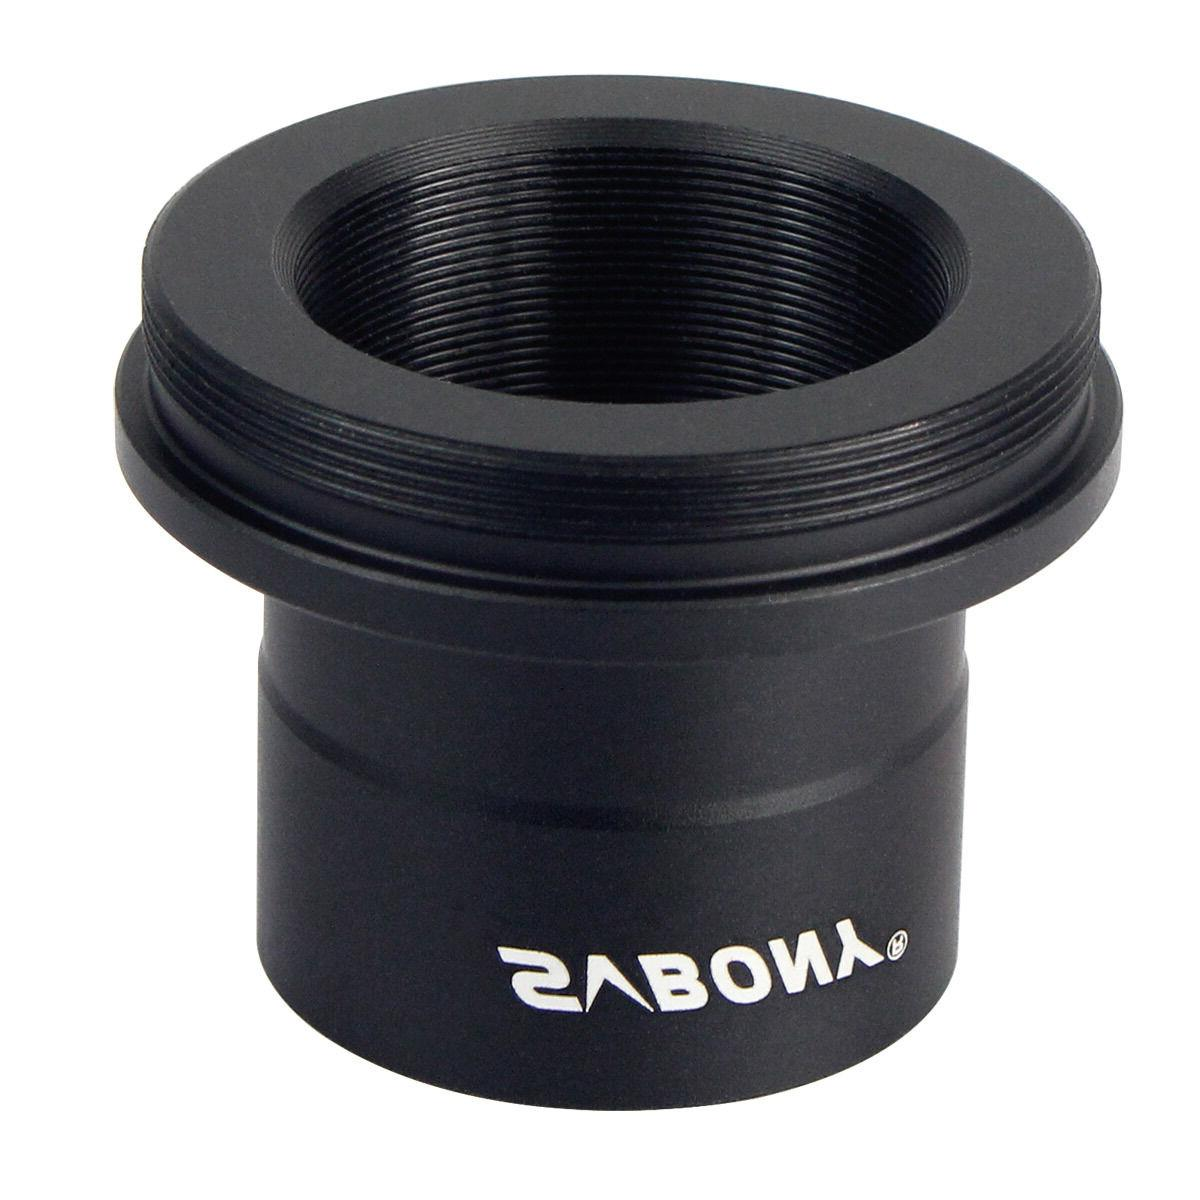 SVBONY T2 Nikon Cameras Lens + Telescope Adapter US